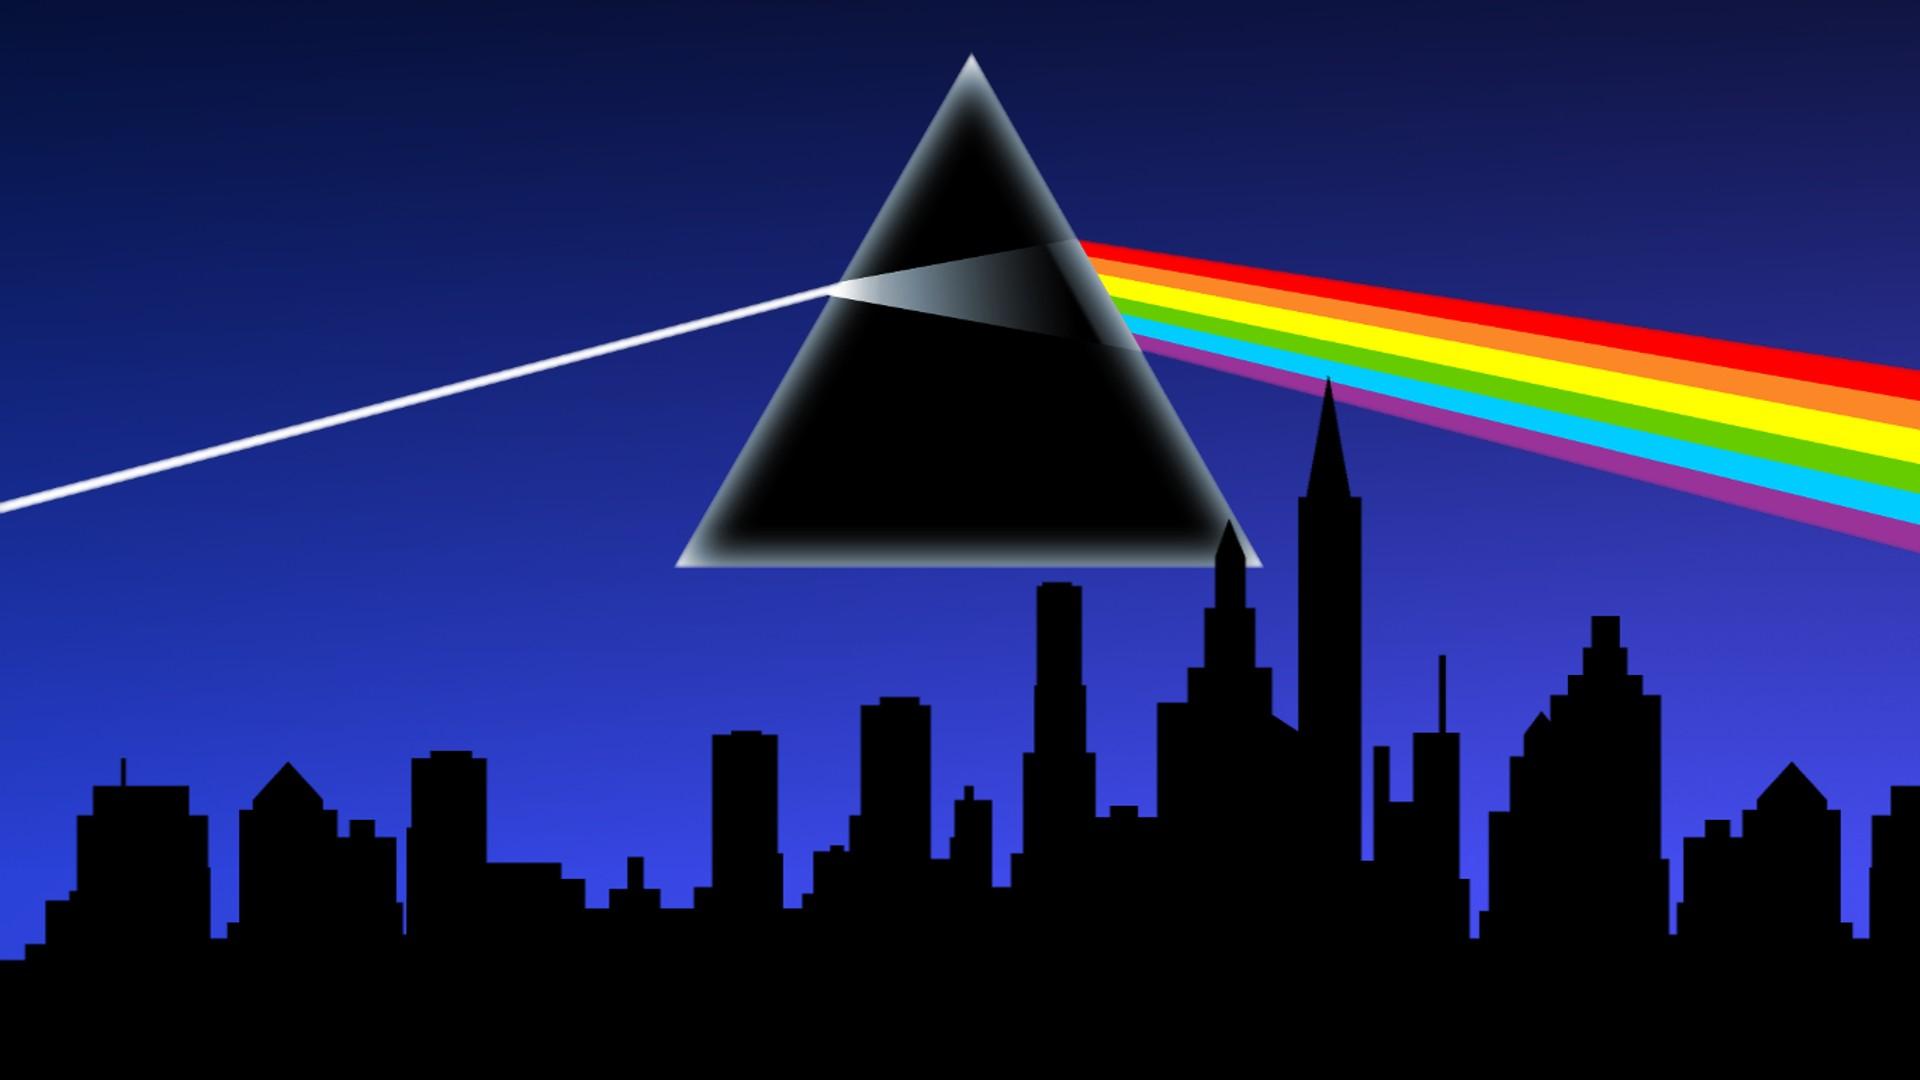 Wallpaper 1920x1080 Px Cityscape Pink Floyd 1920x1080 Wallhaven 1411835 Hd Wallpapers Wallhere